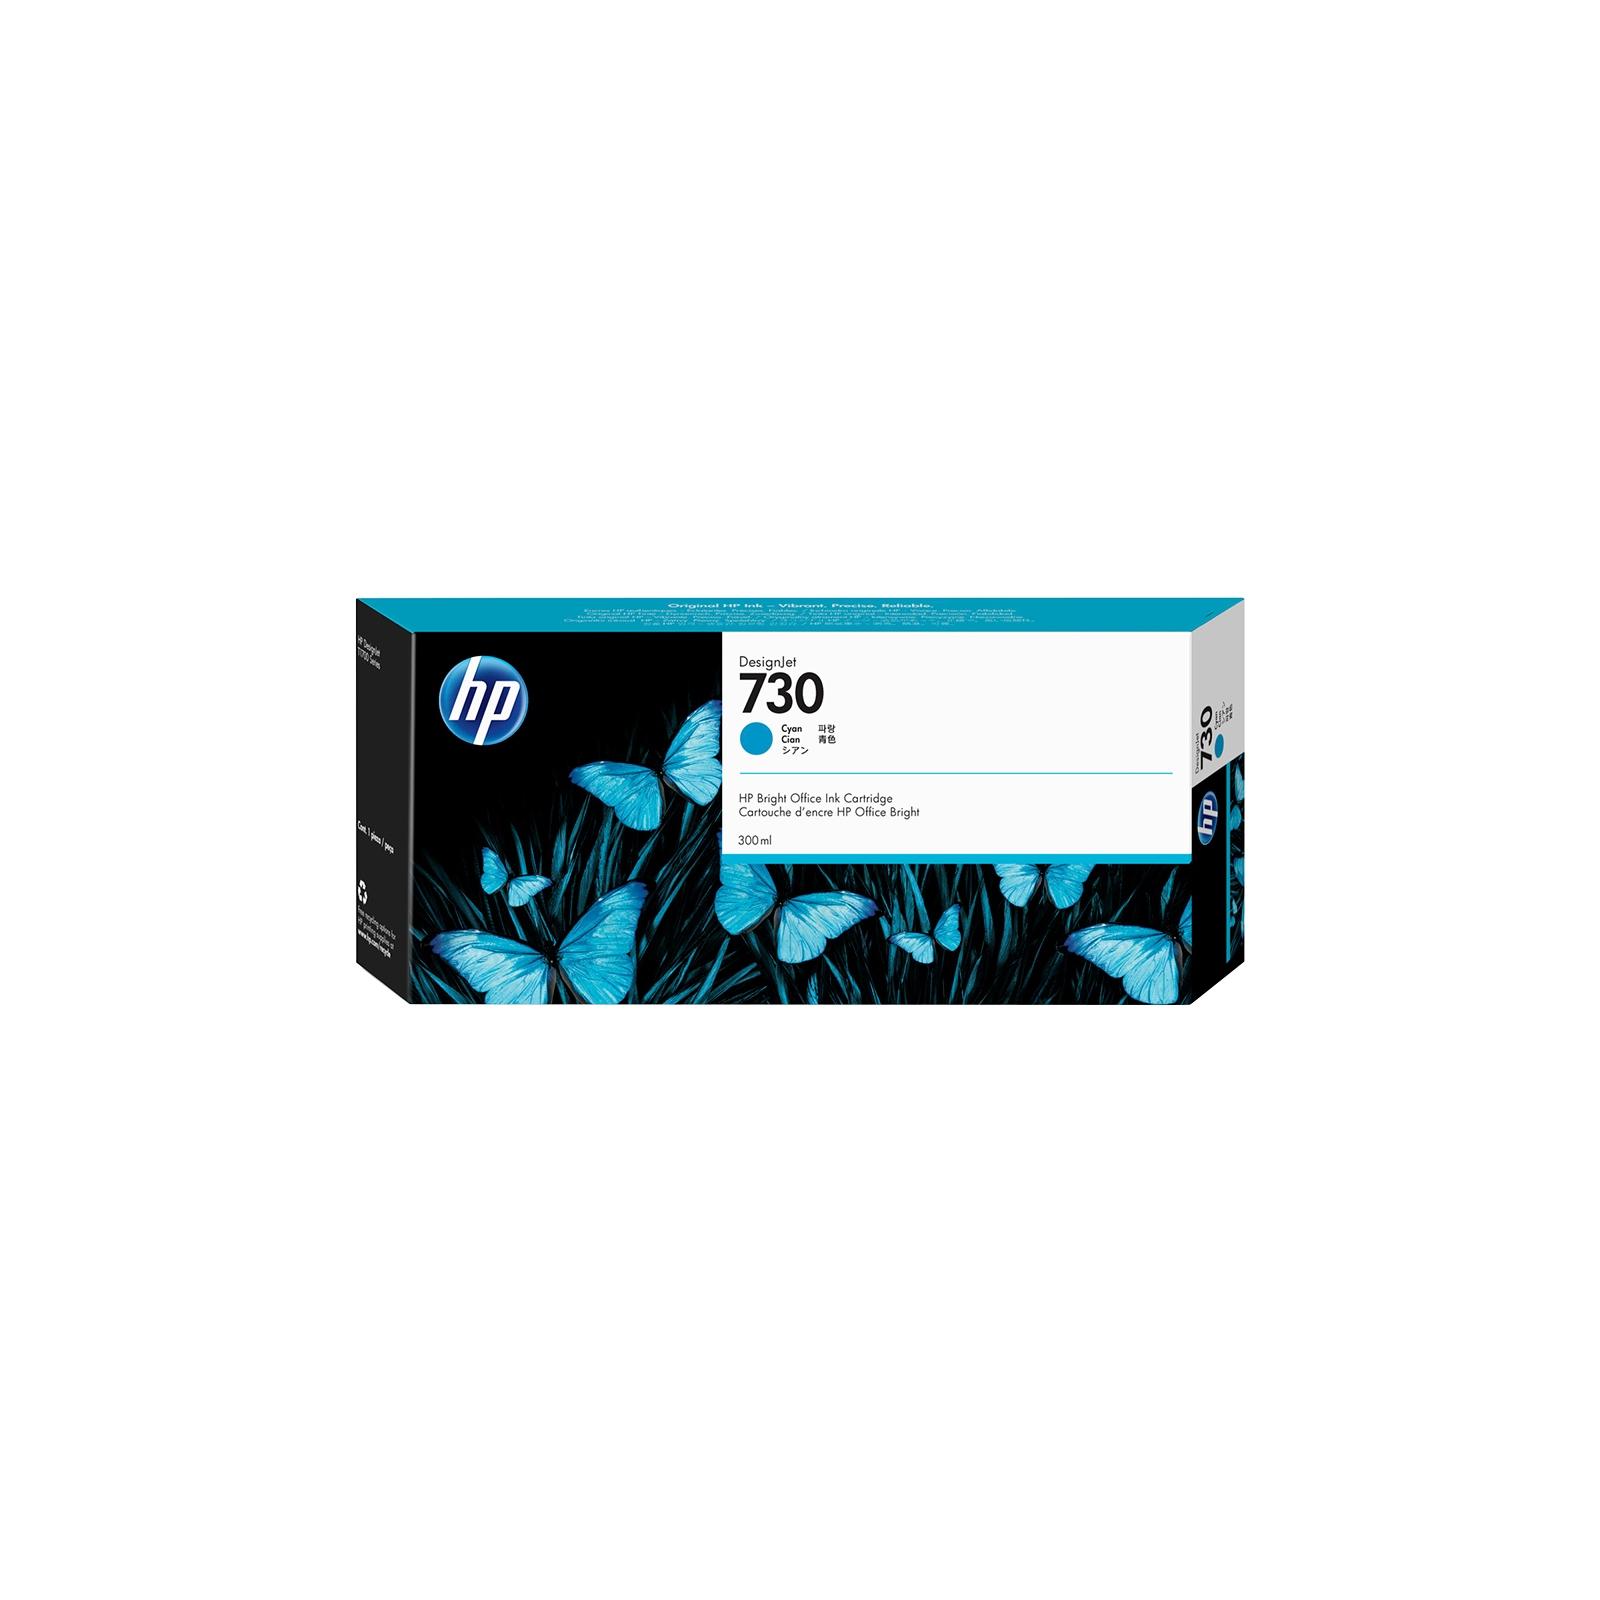 Картридж HP DJ No.730 300ml Cyan (P2V68A)